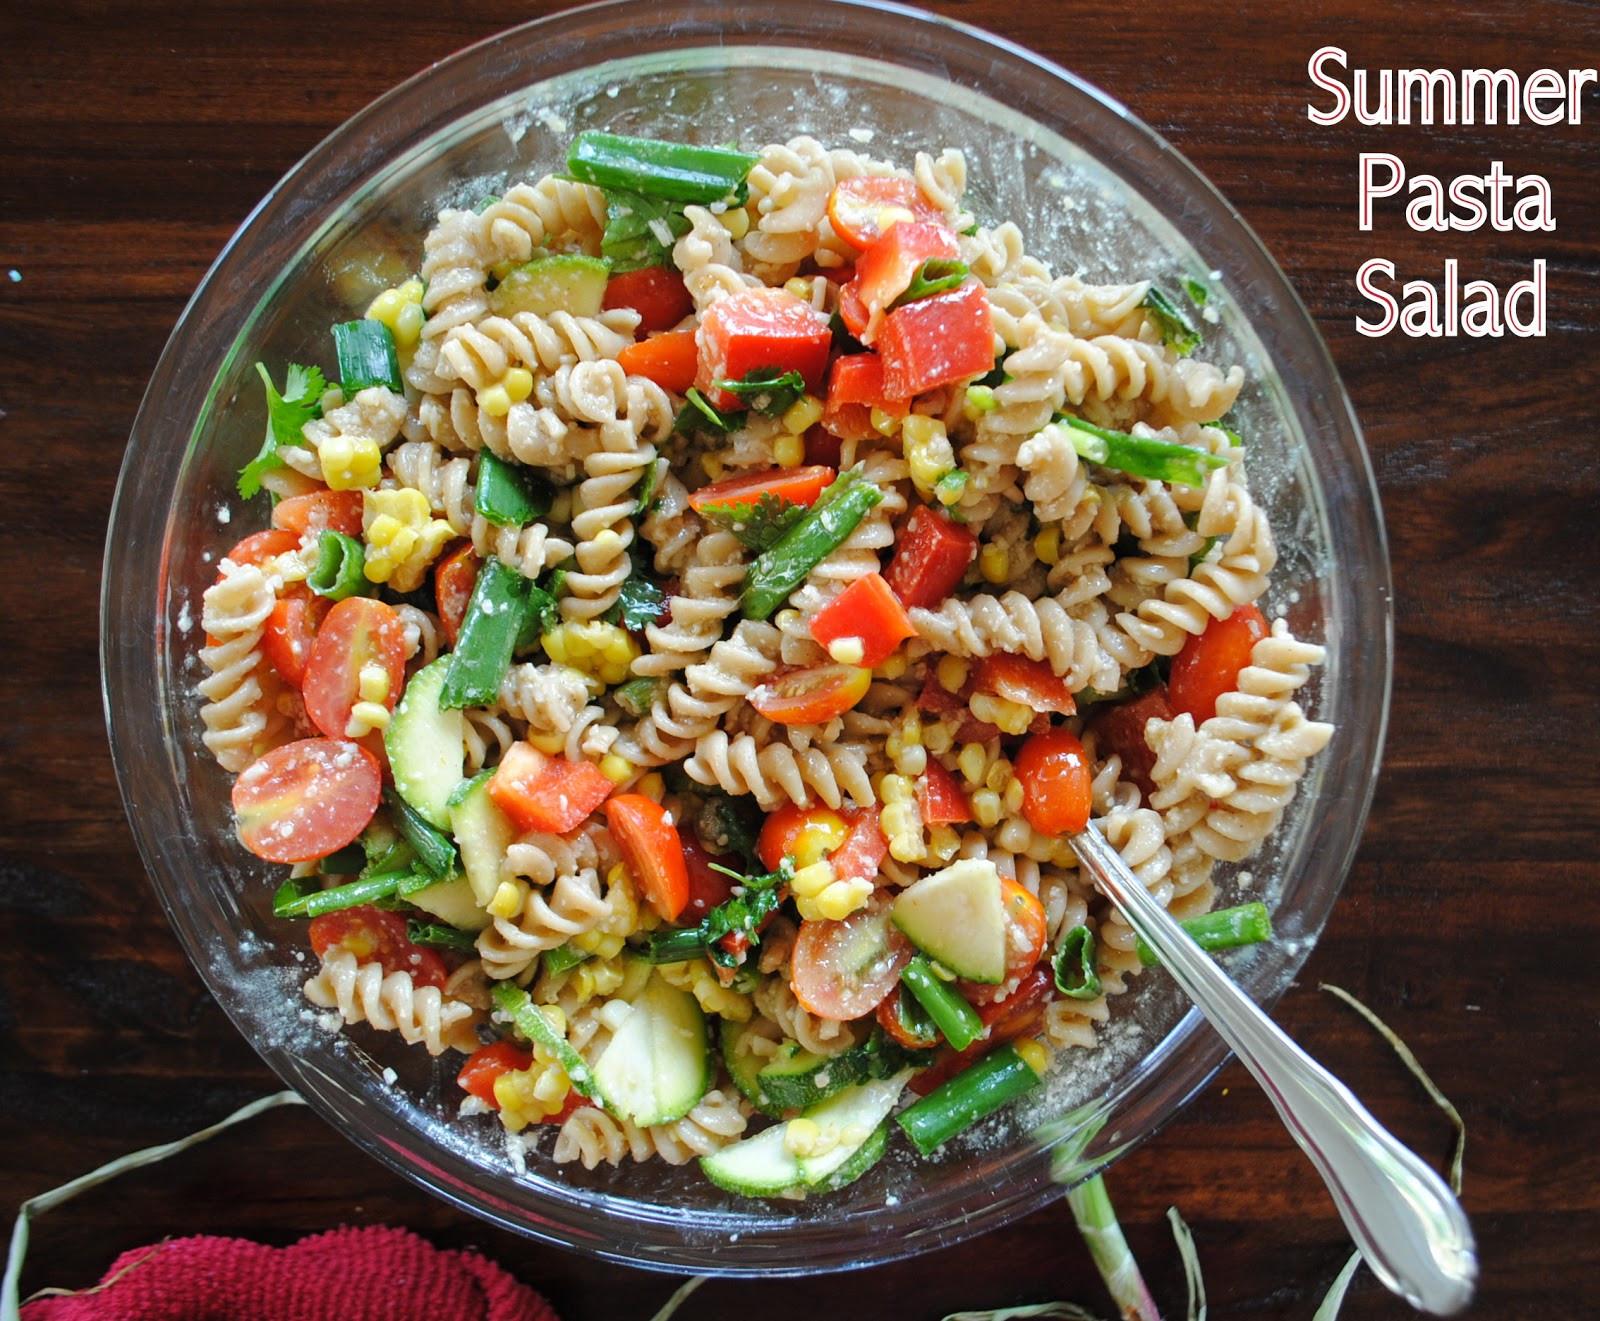 Summer Pasta Salad  ThriceTheSpice Summer Pasta Salad